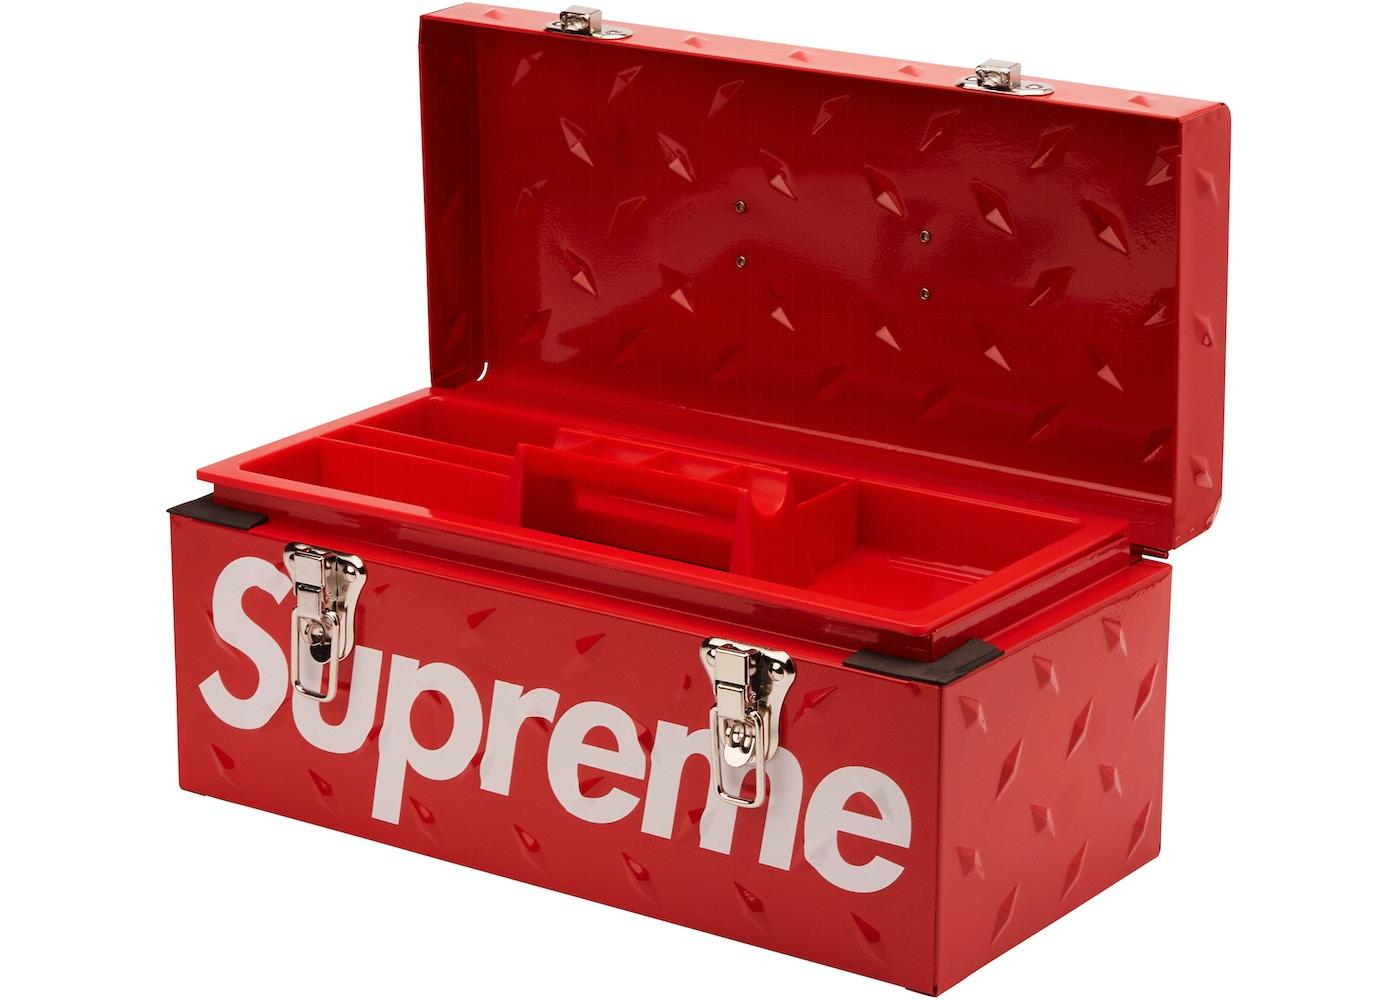 Supreme Diamond Plate Tool Box Red   FW20